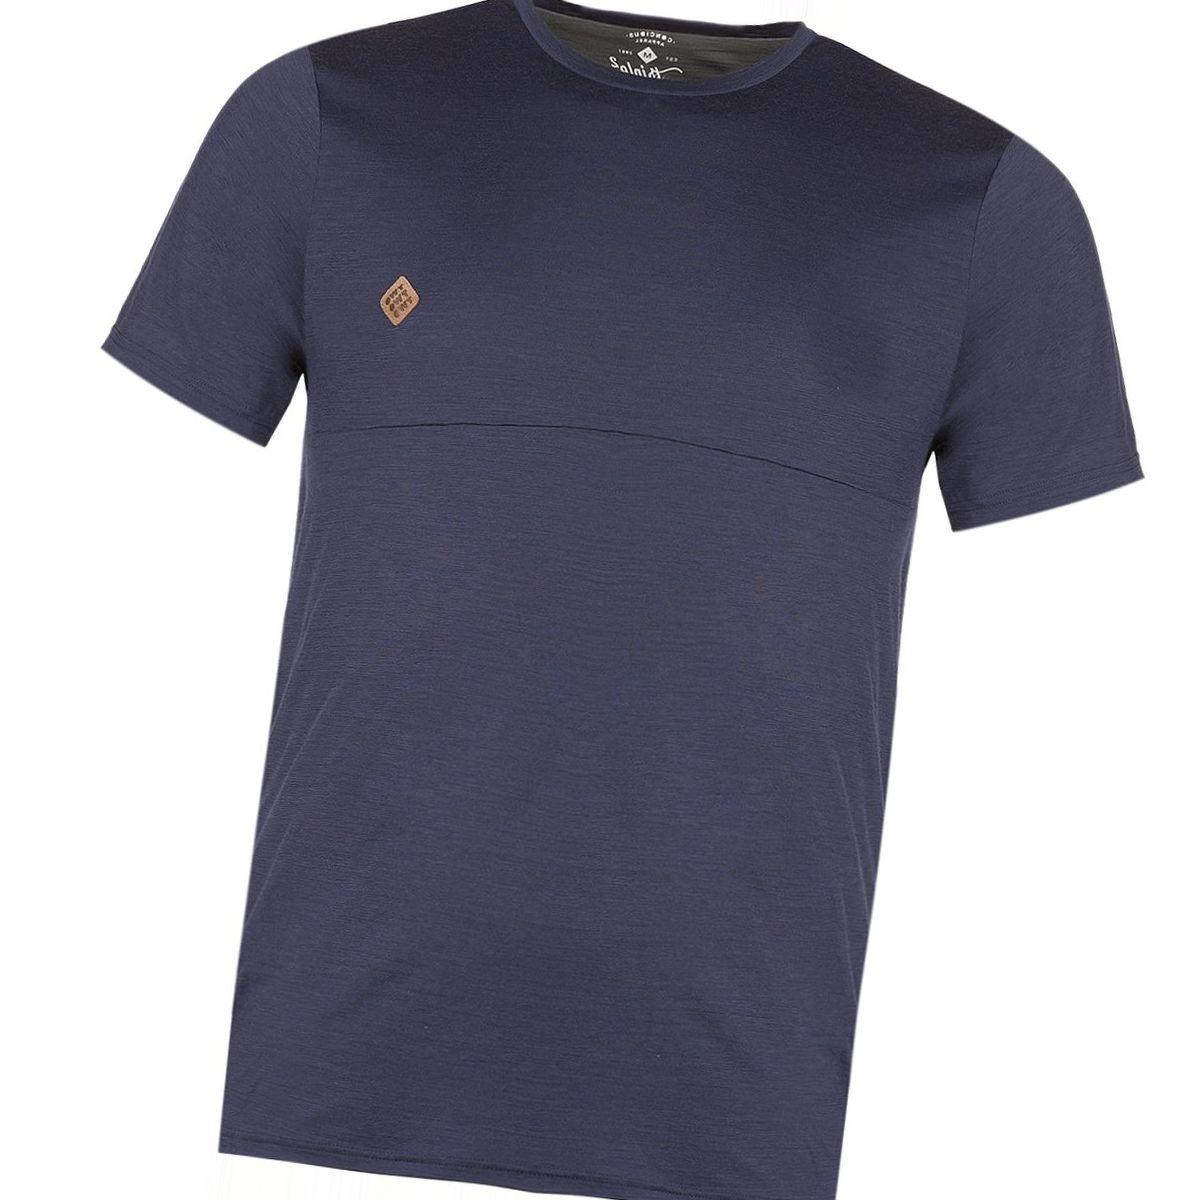 triple2 TUUR Merino Shirt - Men's